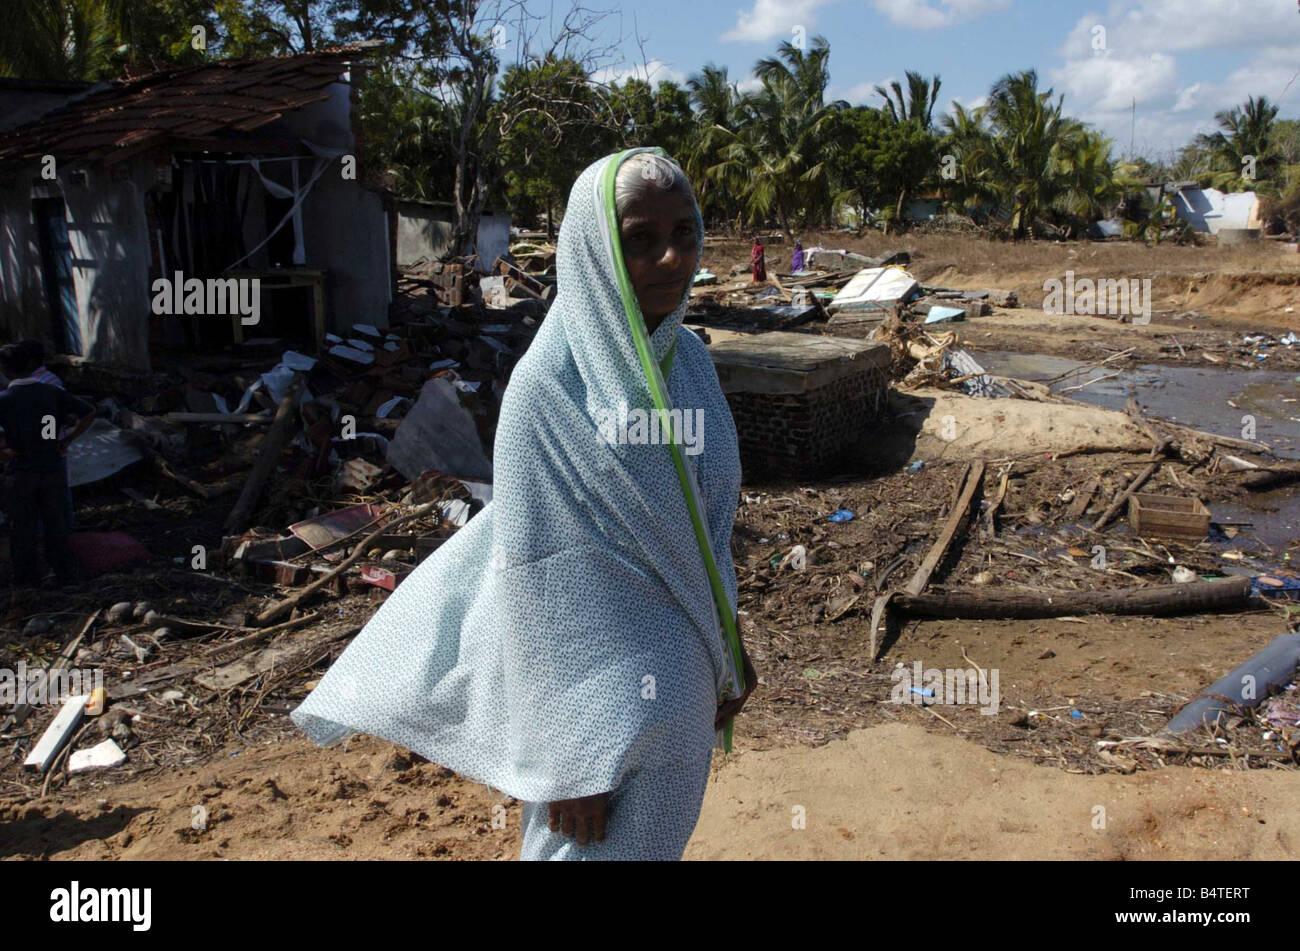 Tsunami Natural Disaster Sri Lanka January 2005 Kenniyan Sri Lanka o p s Grandmother Sahila Jay who abandonned her - Stock Image